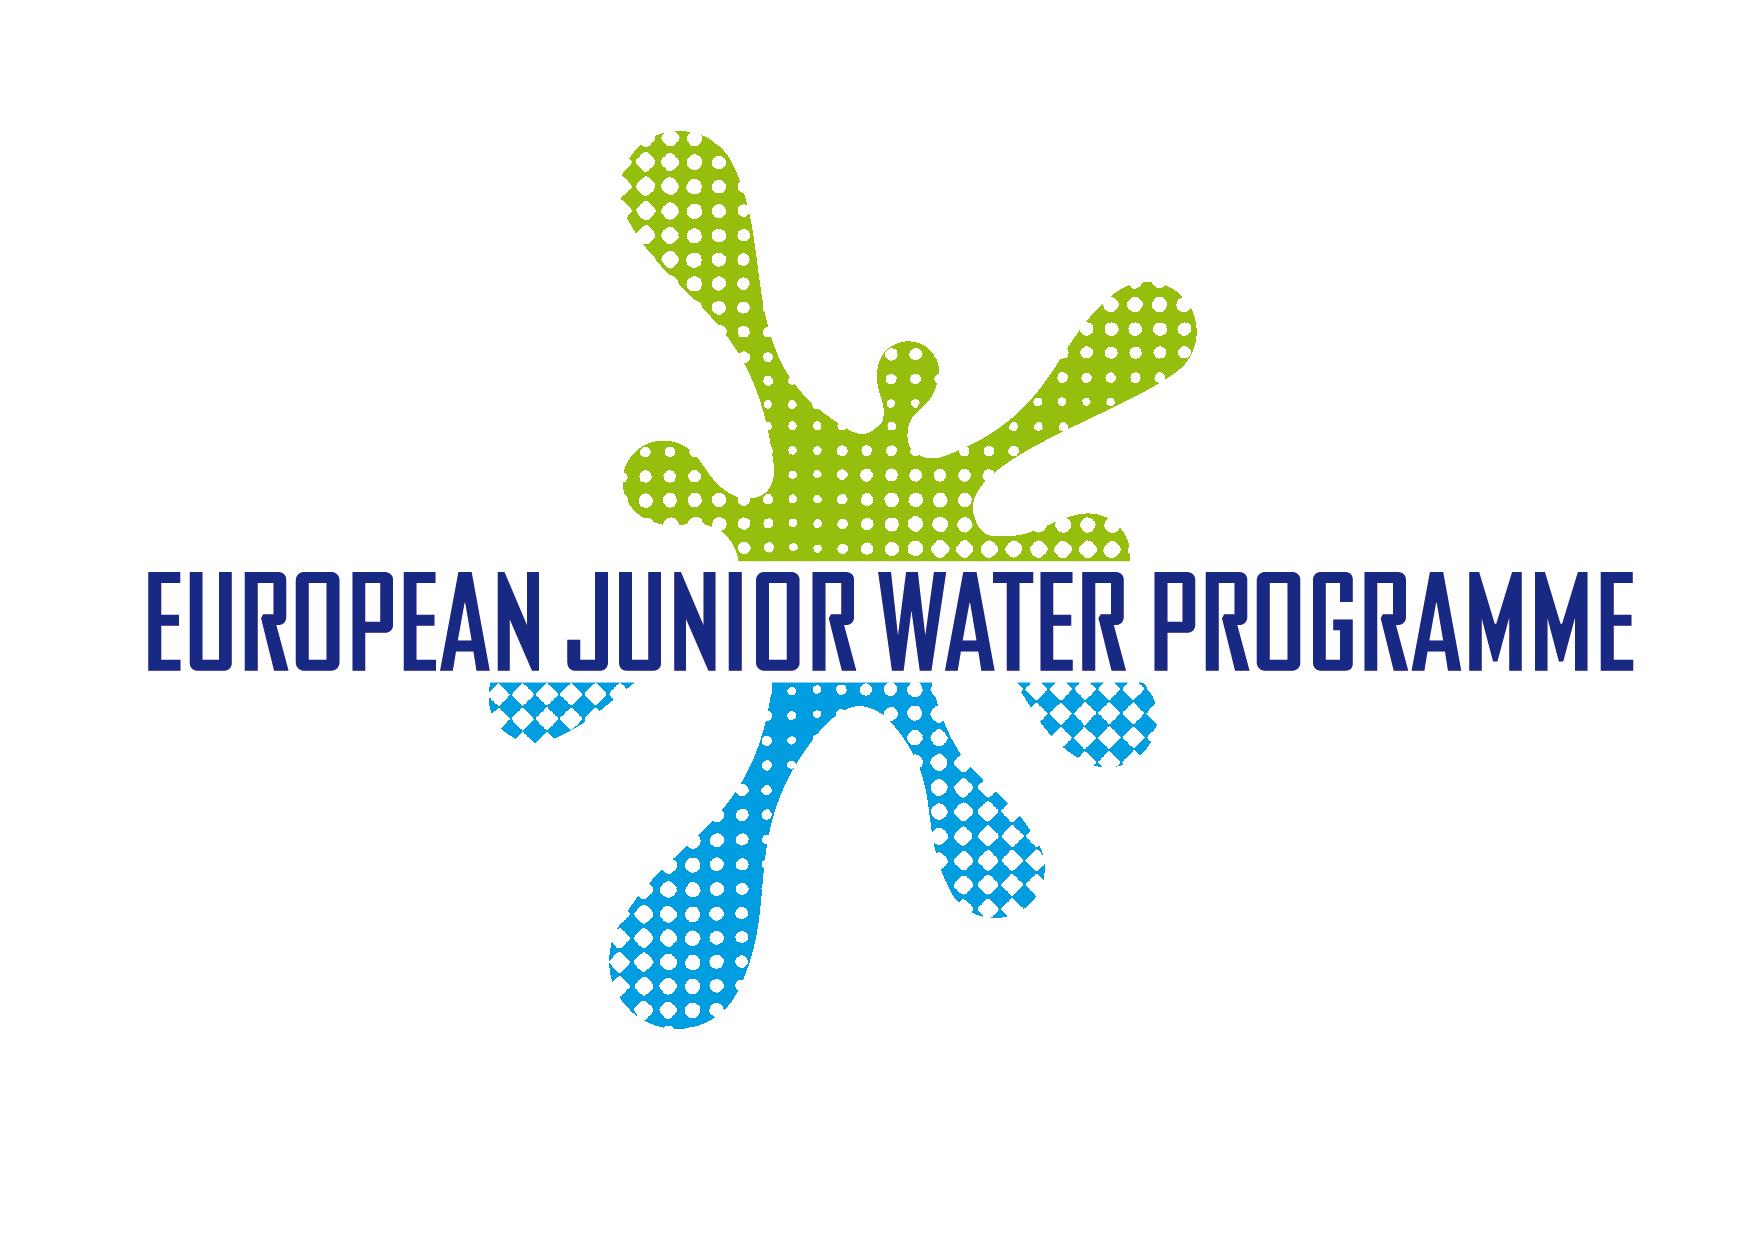 European water partners launch European Junior Water Programme